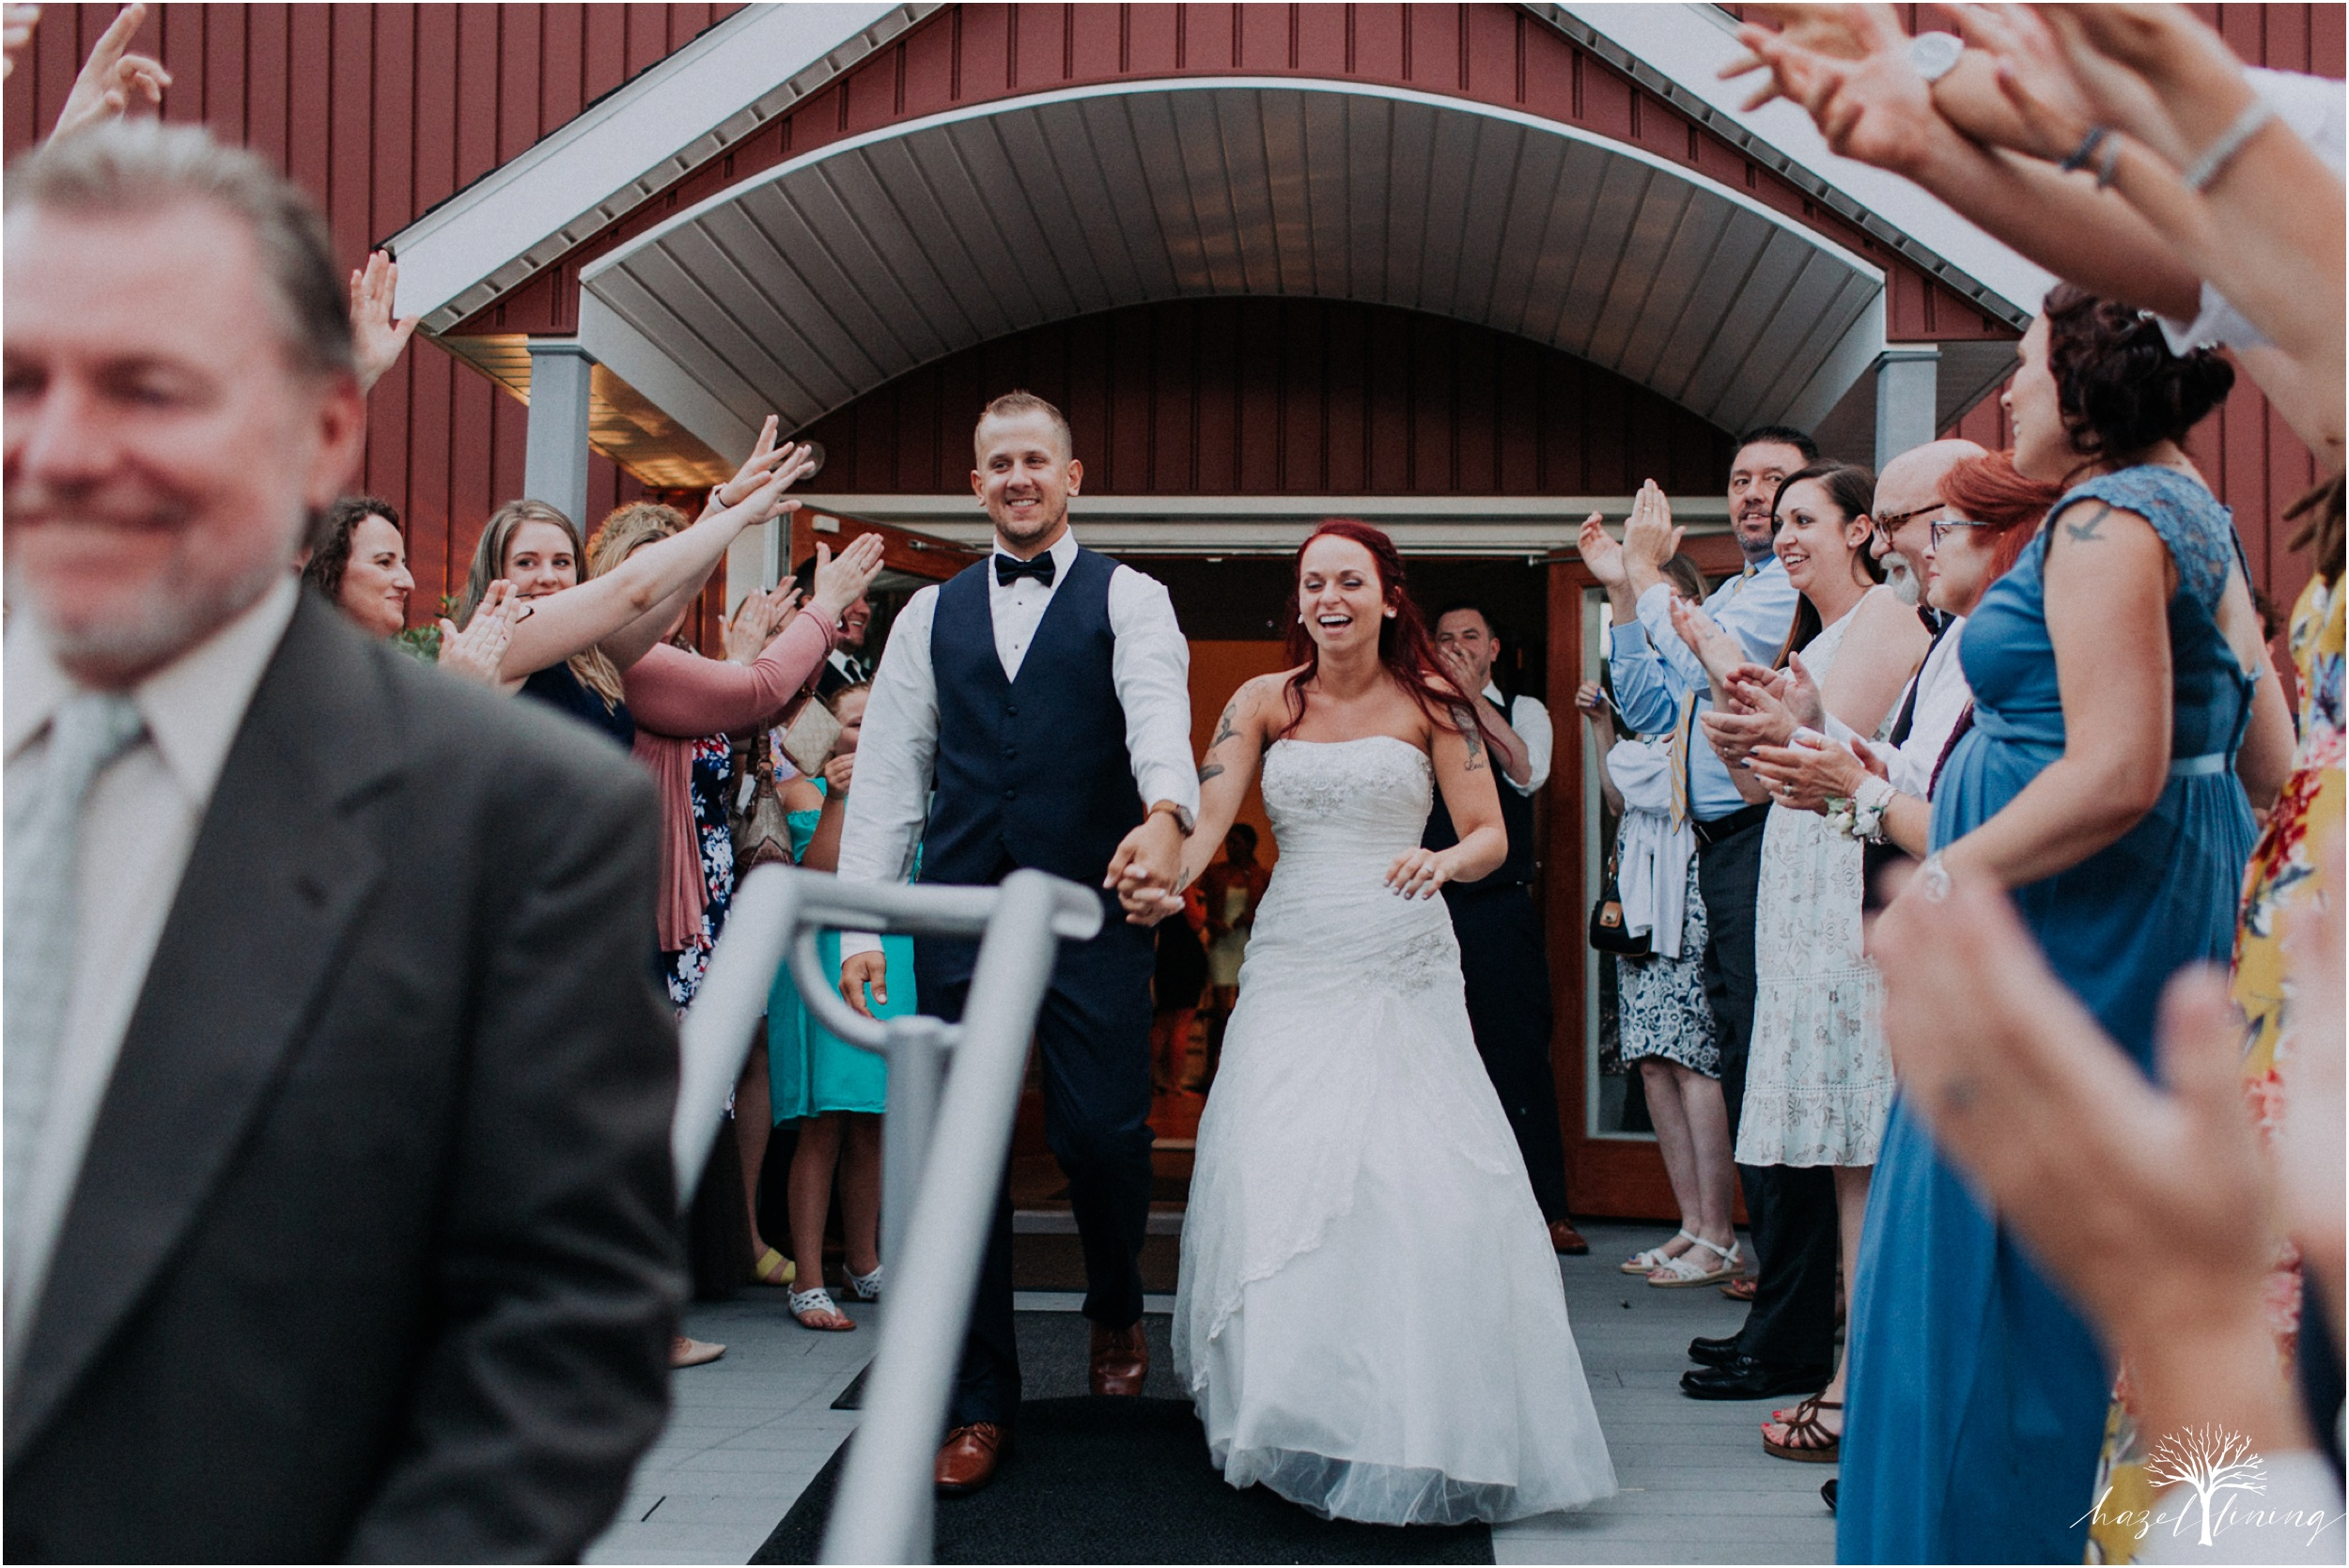 alyssa-james-stiteler-wedding-loft-and-sweet-water-cc-pennsburg-pennsylvania-hazel-lining-travel-wedding-elopement-photography_0155.jpg